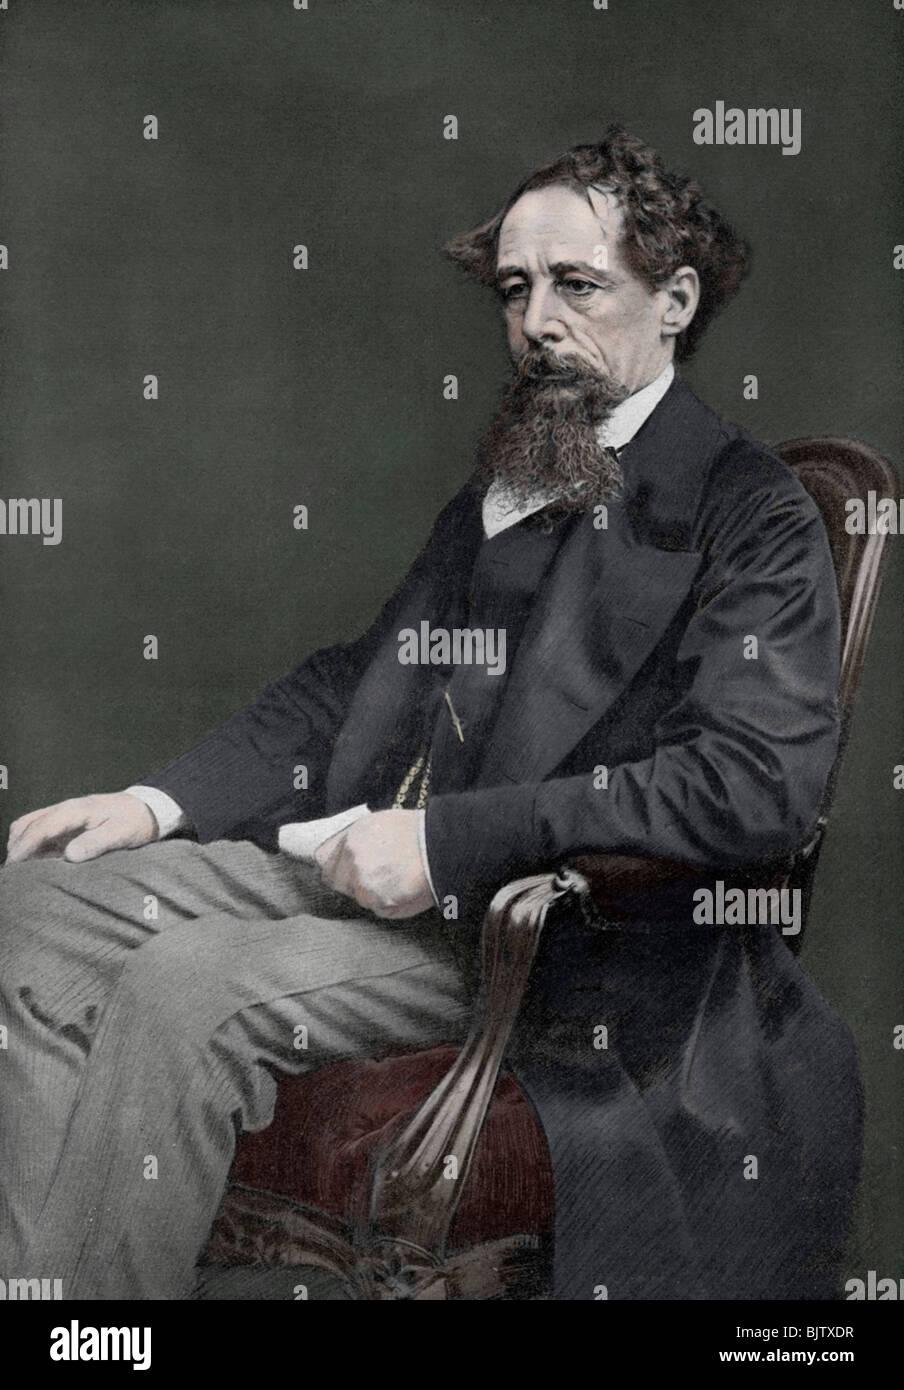 Charles Dickens, 19th century English author, (1910). - Stock Image